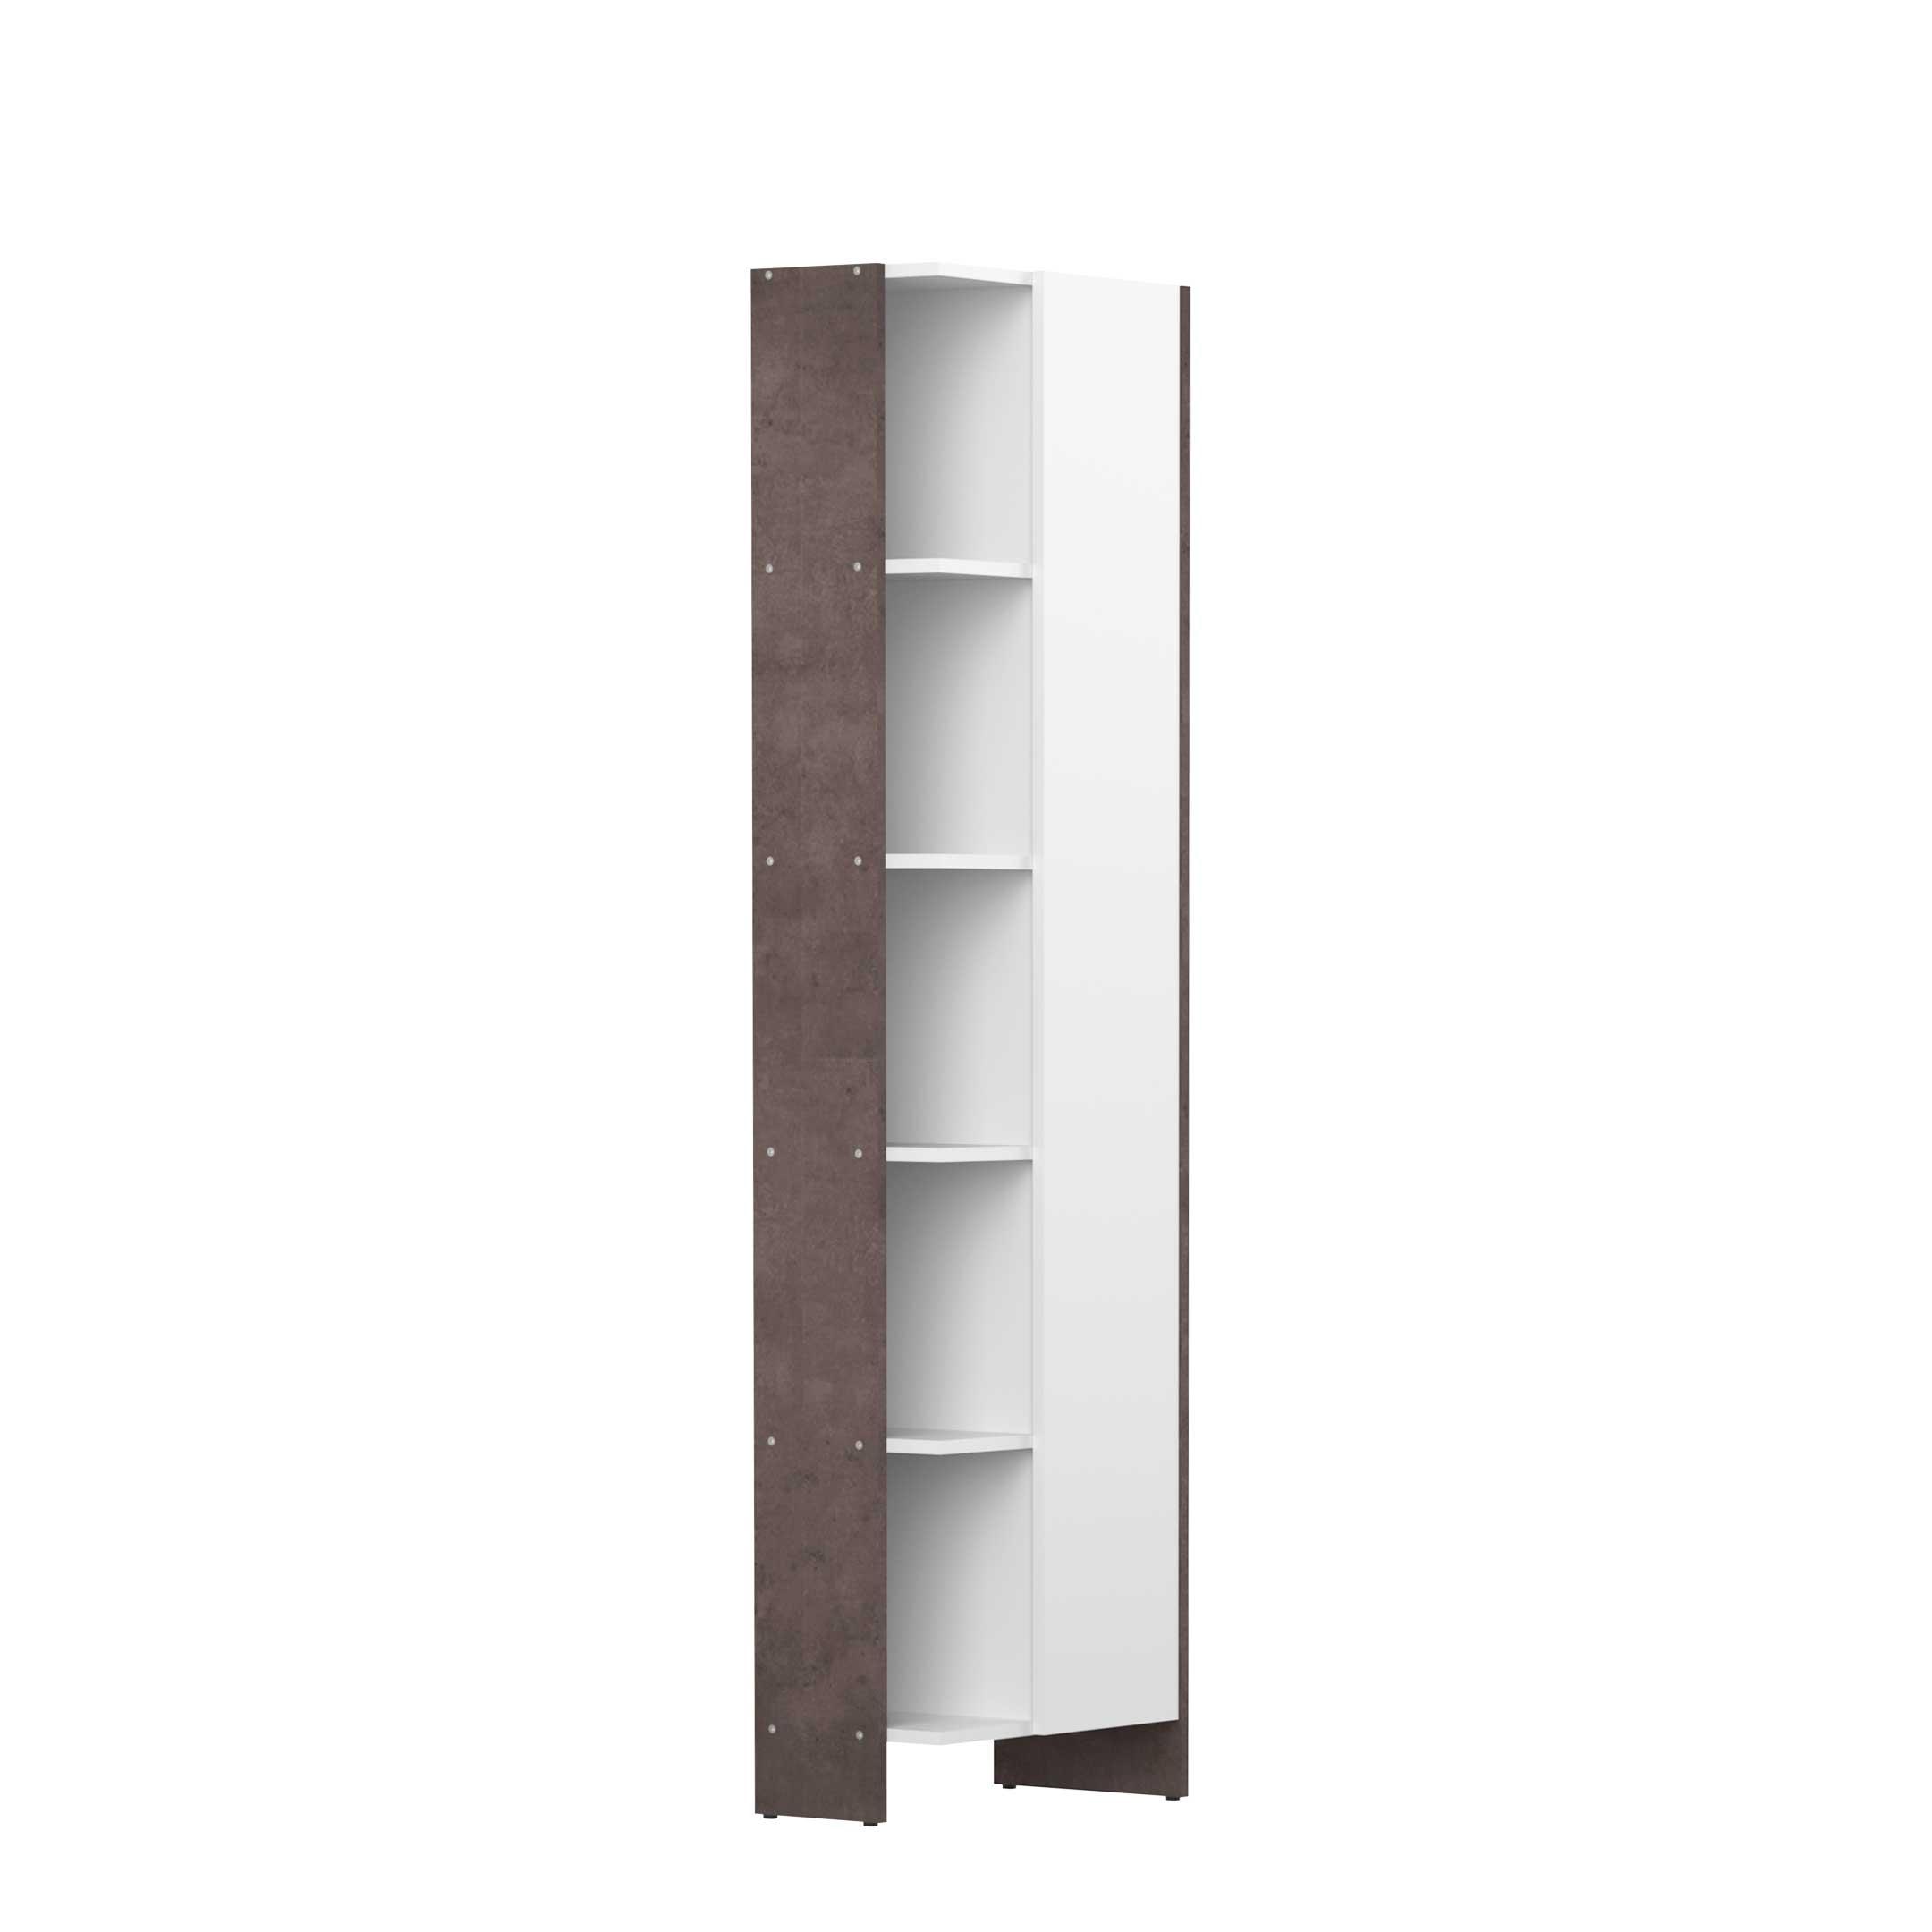 Kolomkastje Biarritz 1 deur wit beton